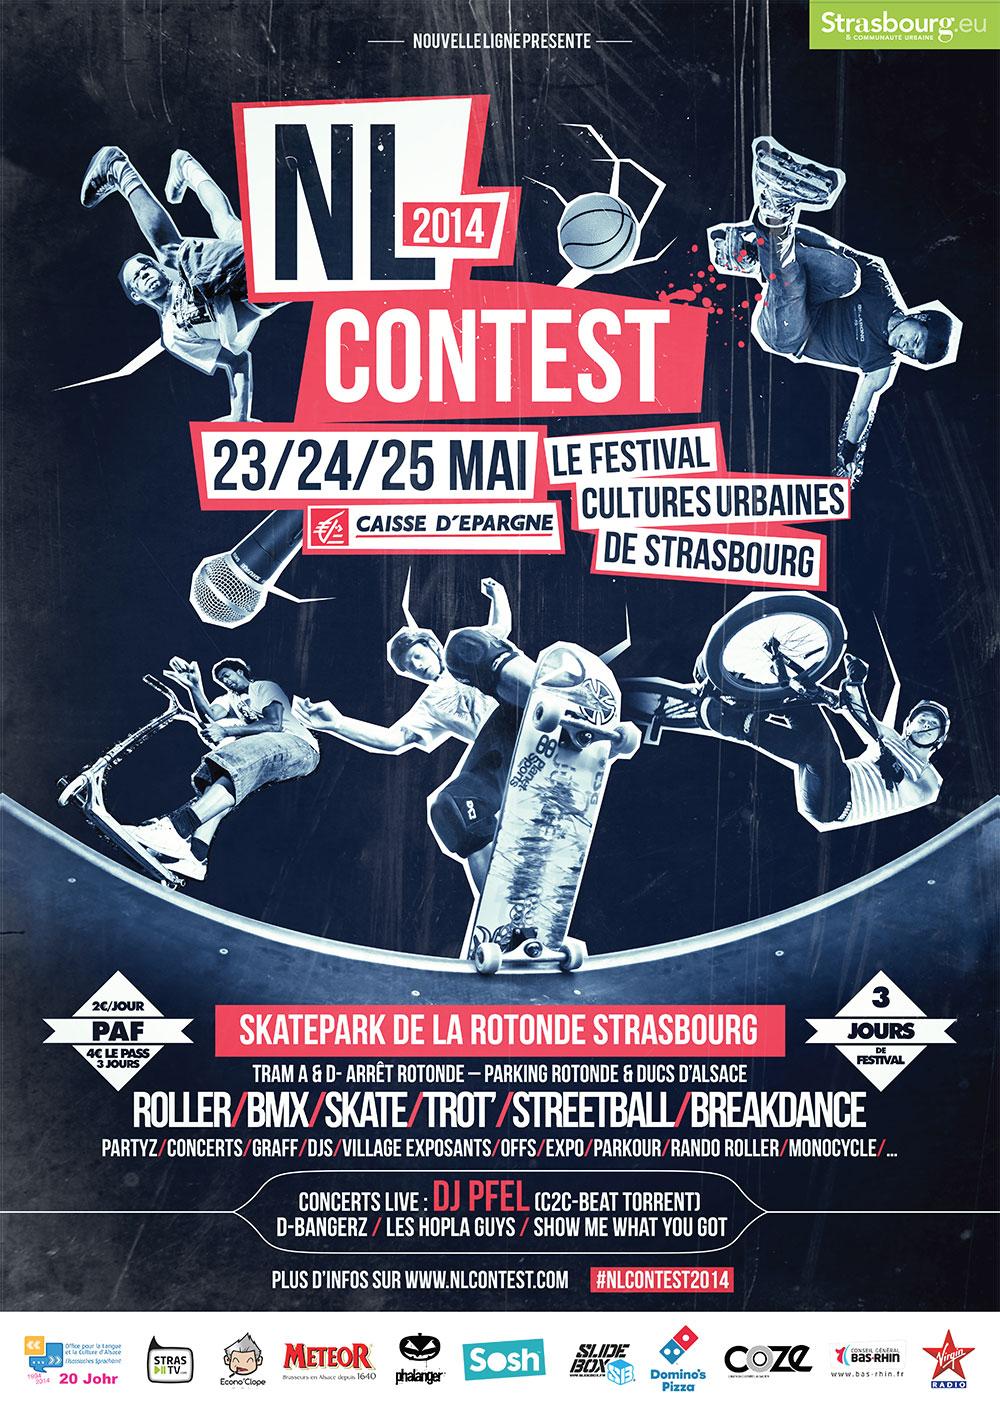 NL Contest